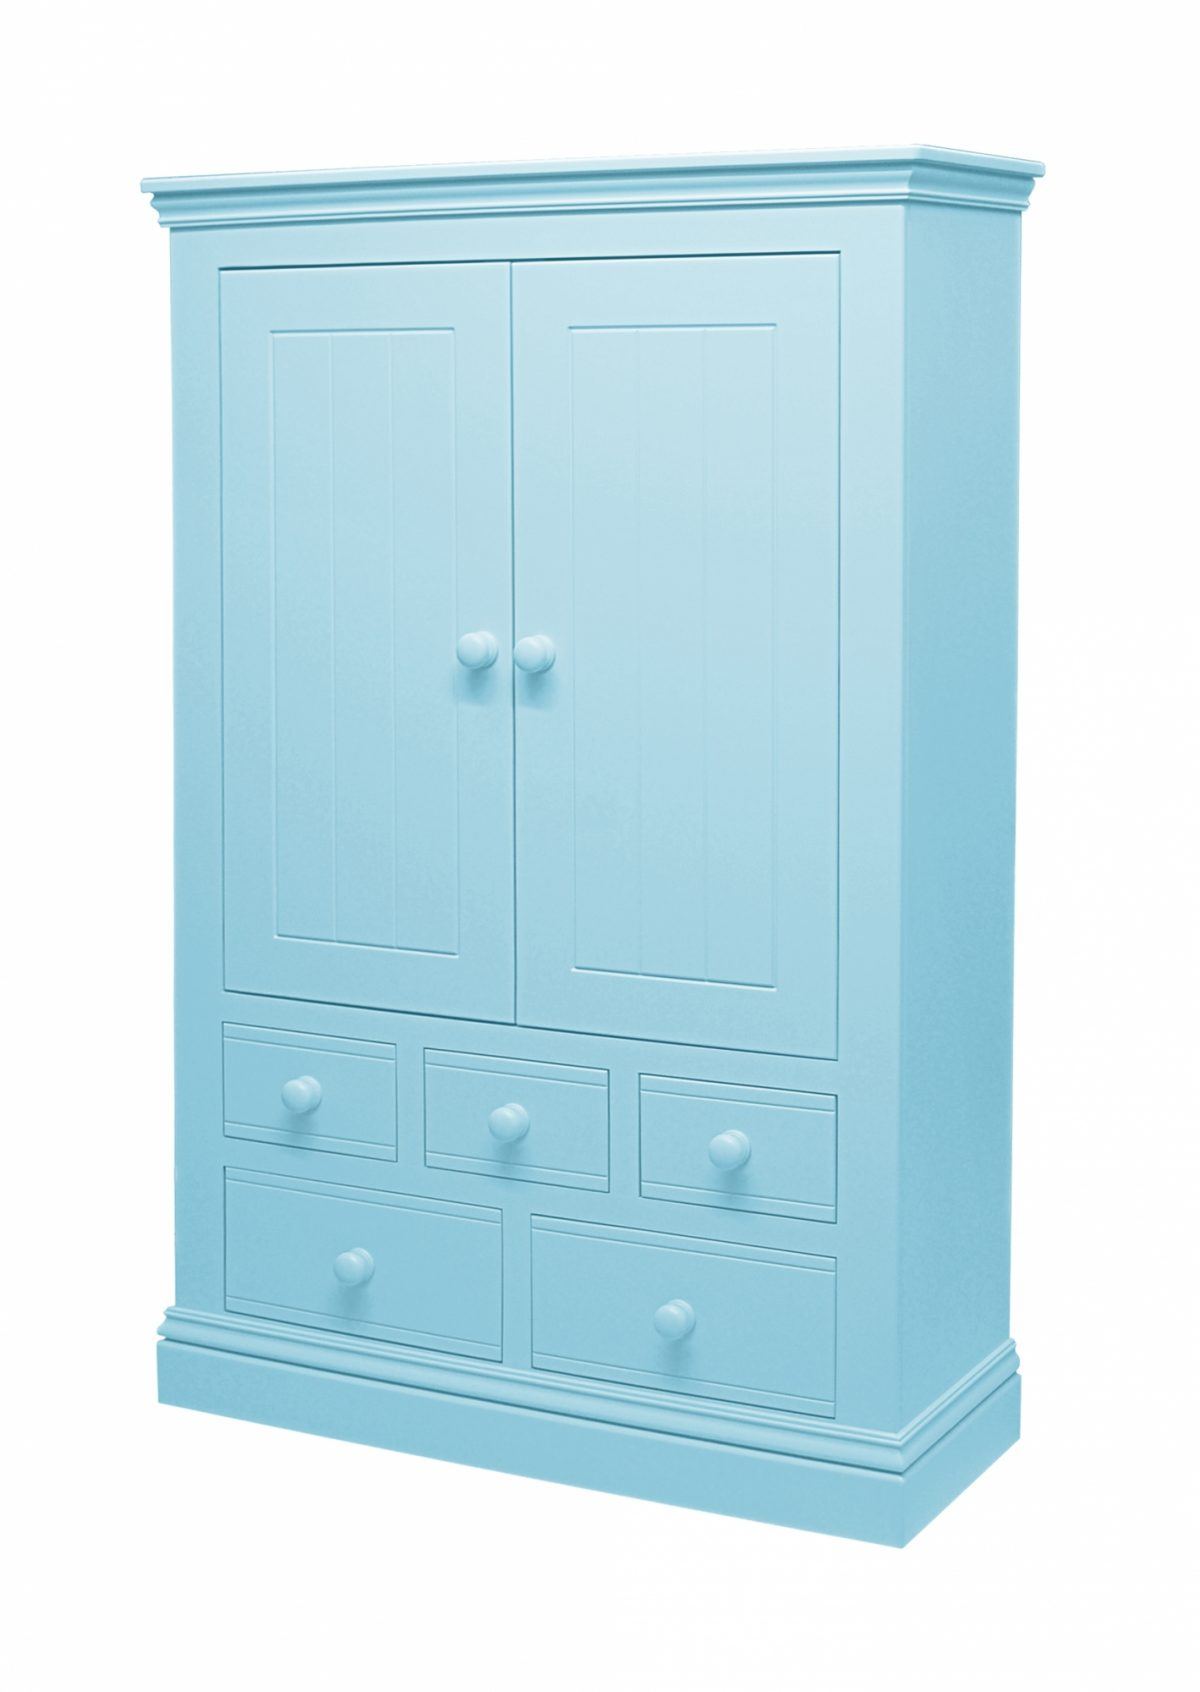 Majestical Grooved Combi Wardrobe Ocean Blue